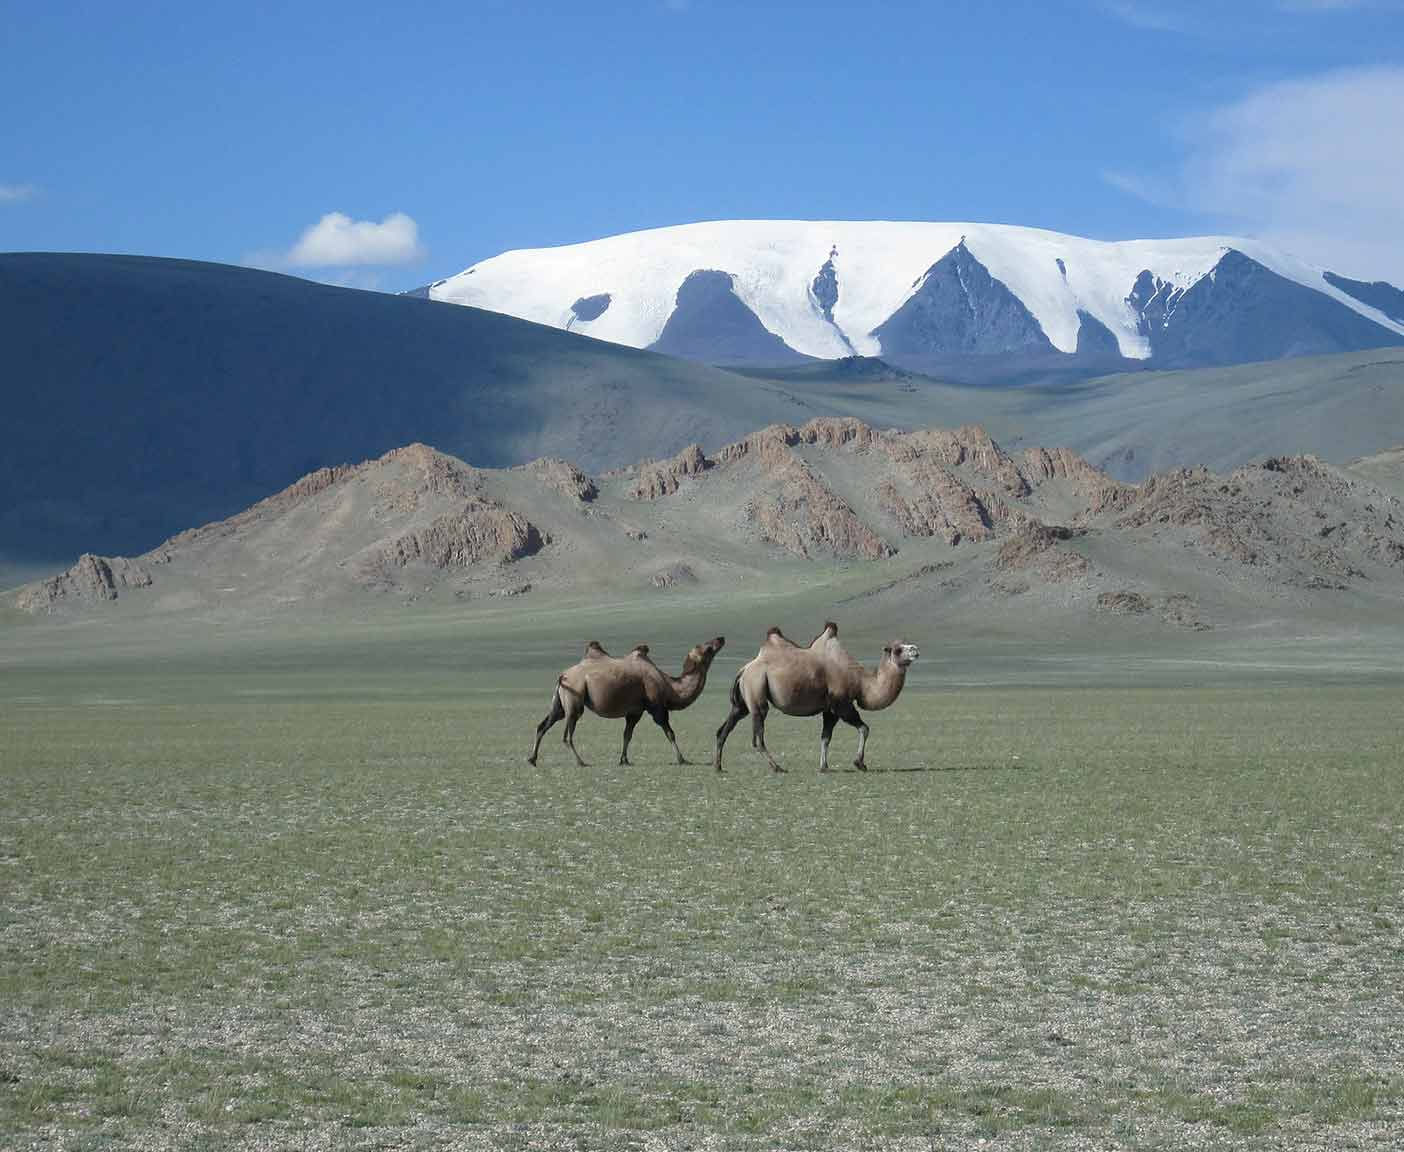 Mongolei-visum-visa-urlaub-china-russland-japan